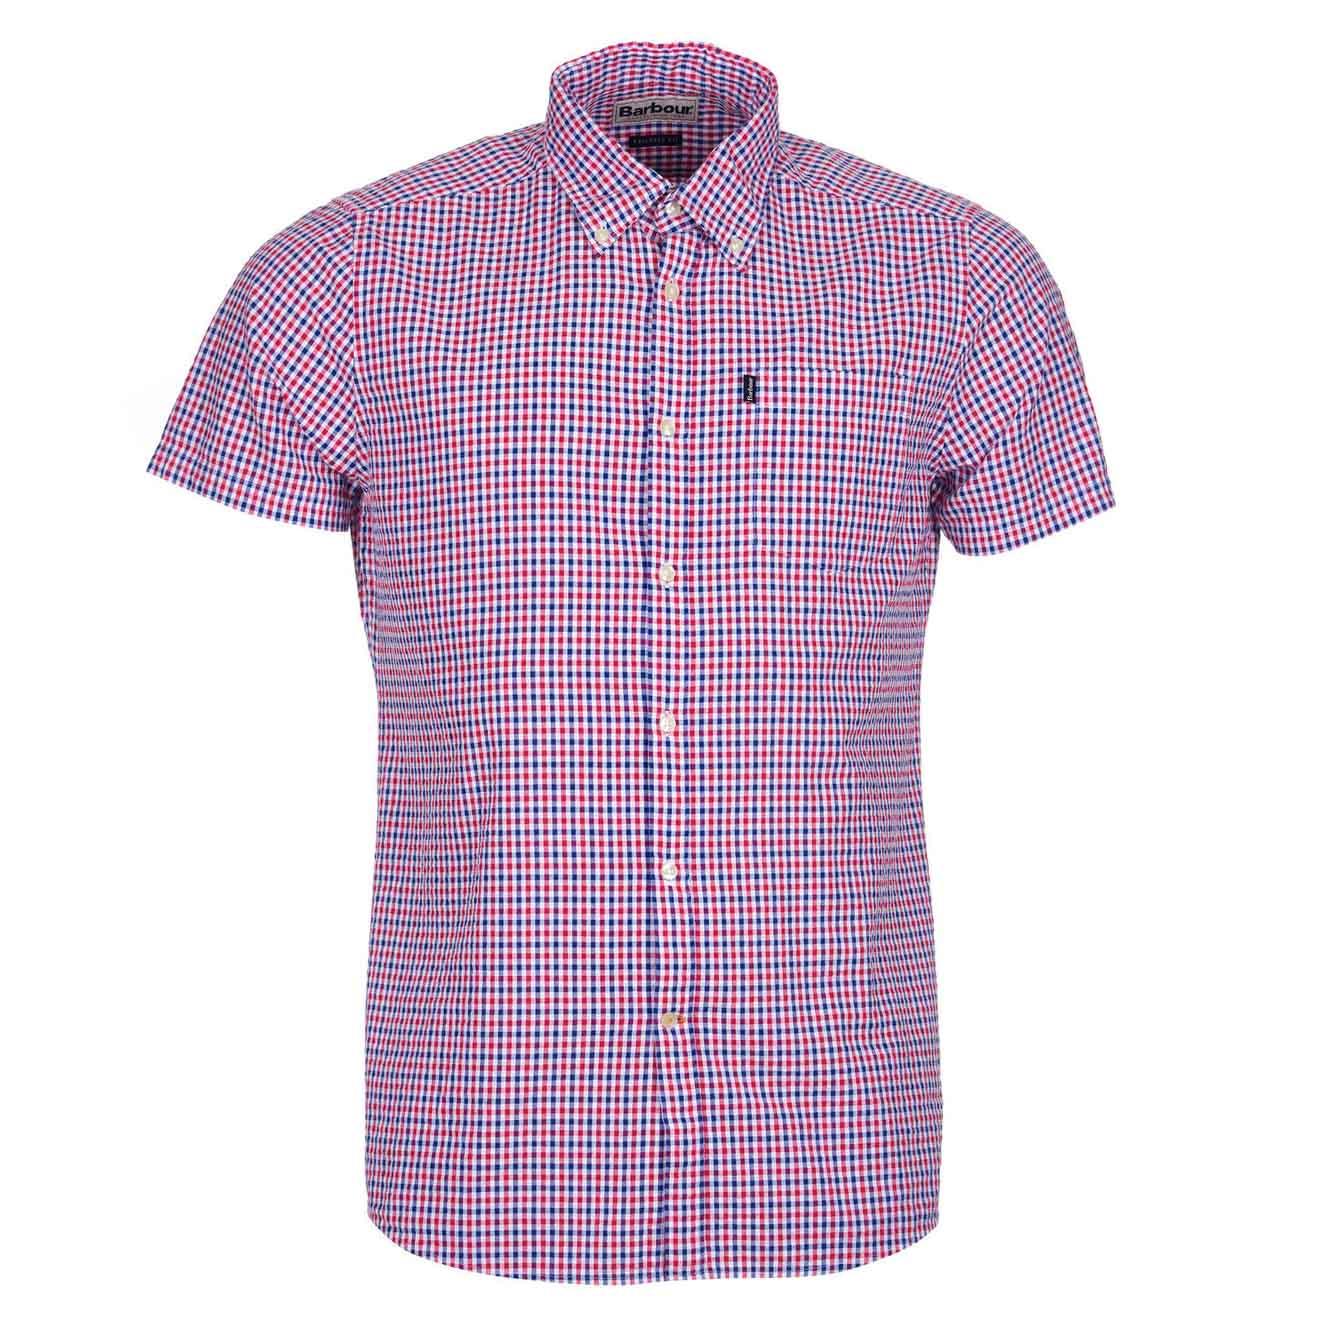 0a541aadc9d Barbour Newton Short Sleeve Shirt Navy